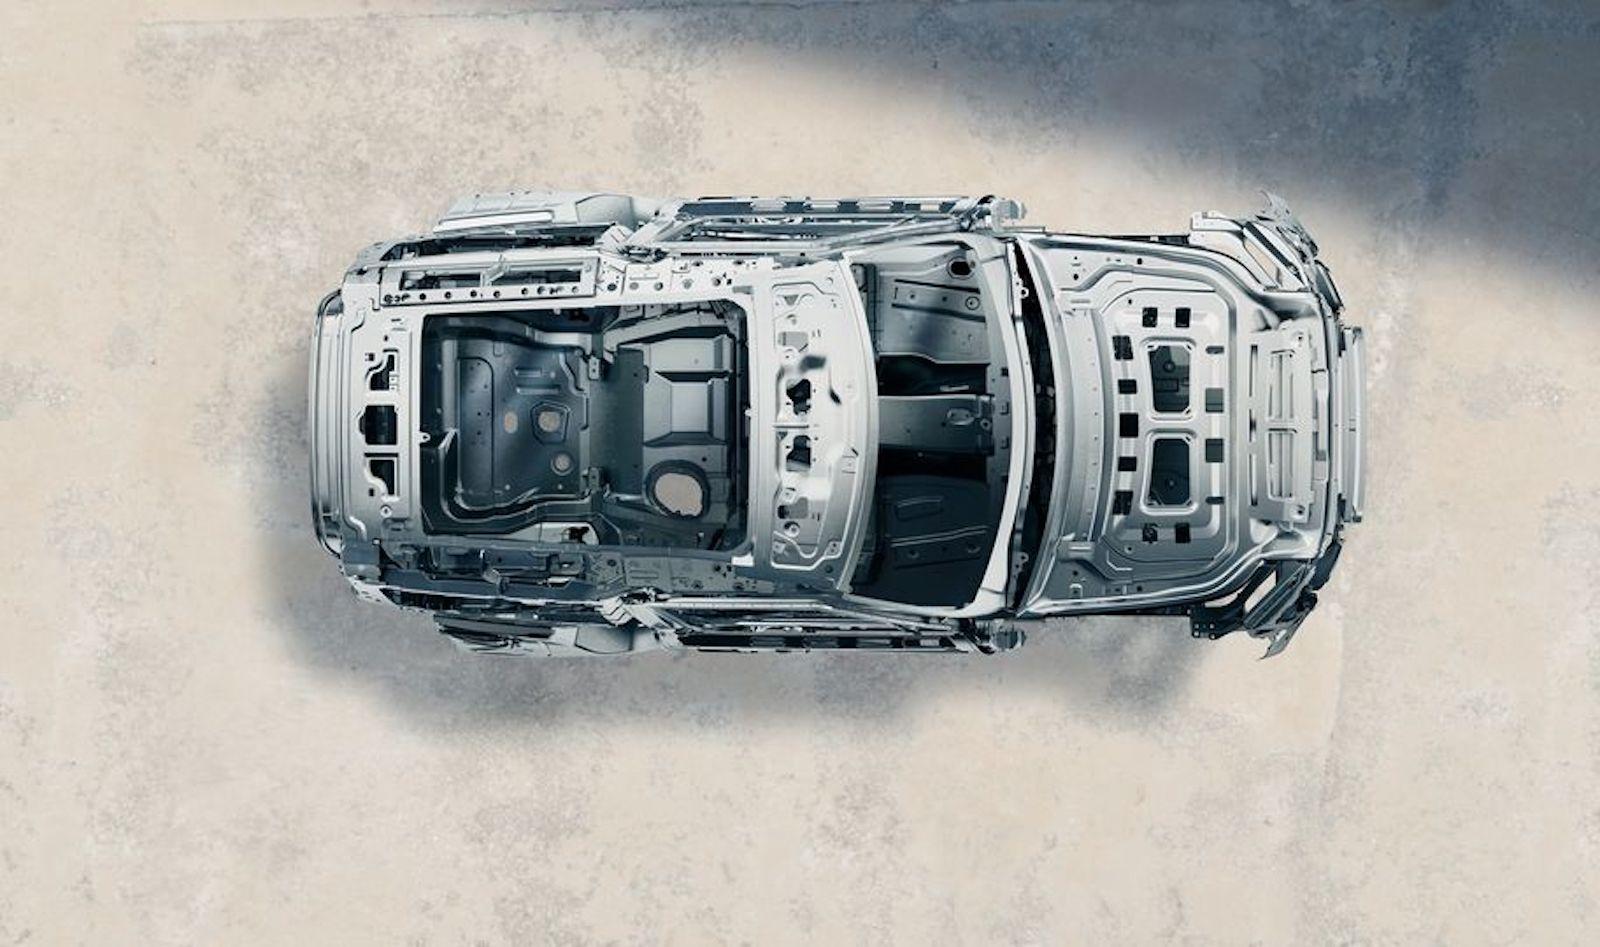 D7x 平台全鋁合金單體式車體結構。